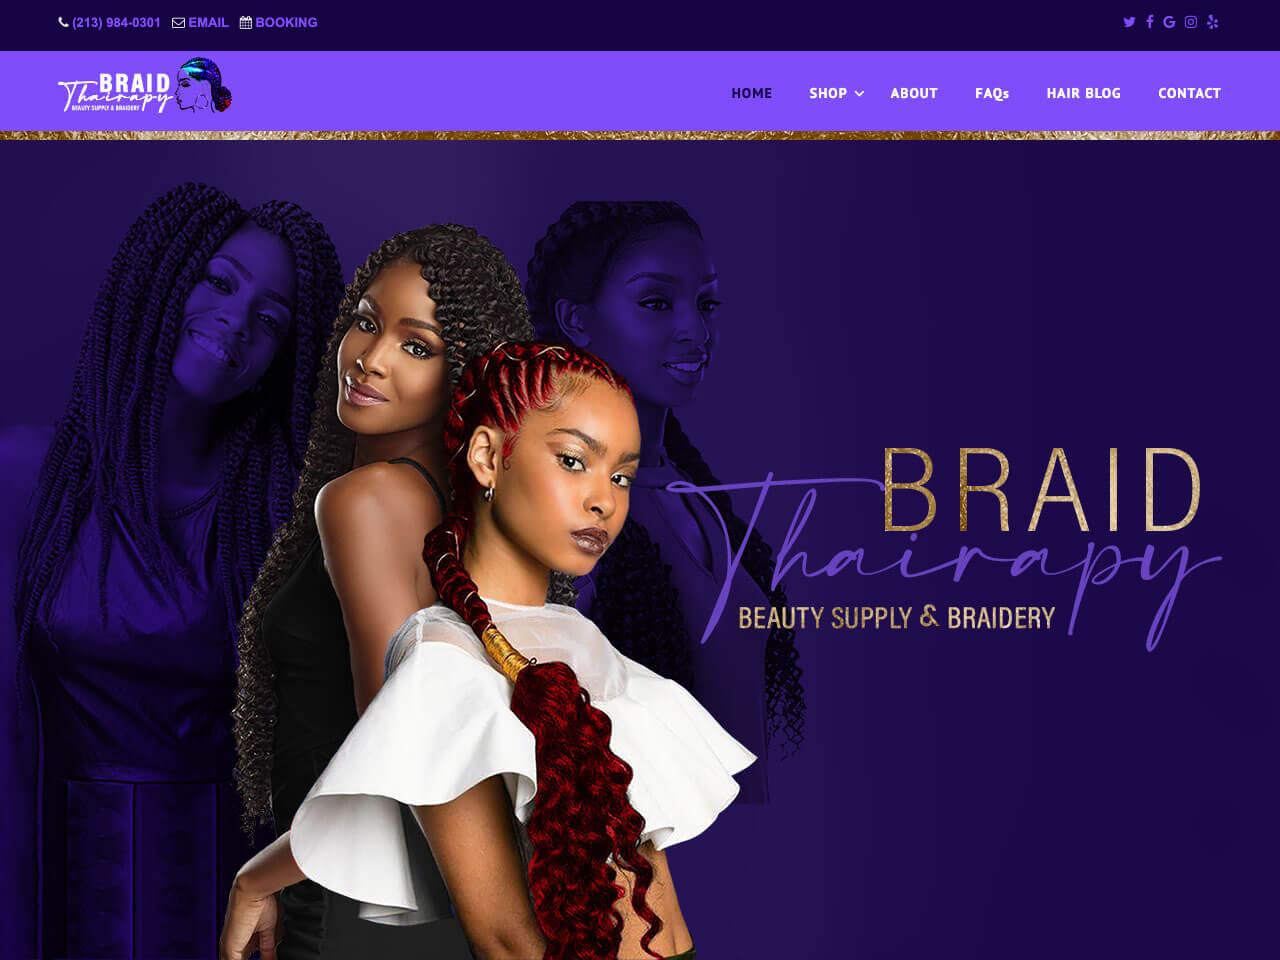 Hair Braiding Salon Website Design by Envisager Studio